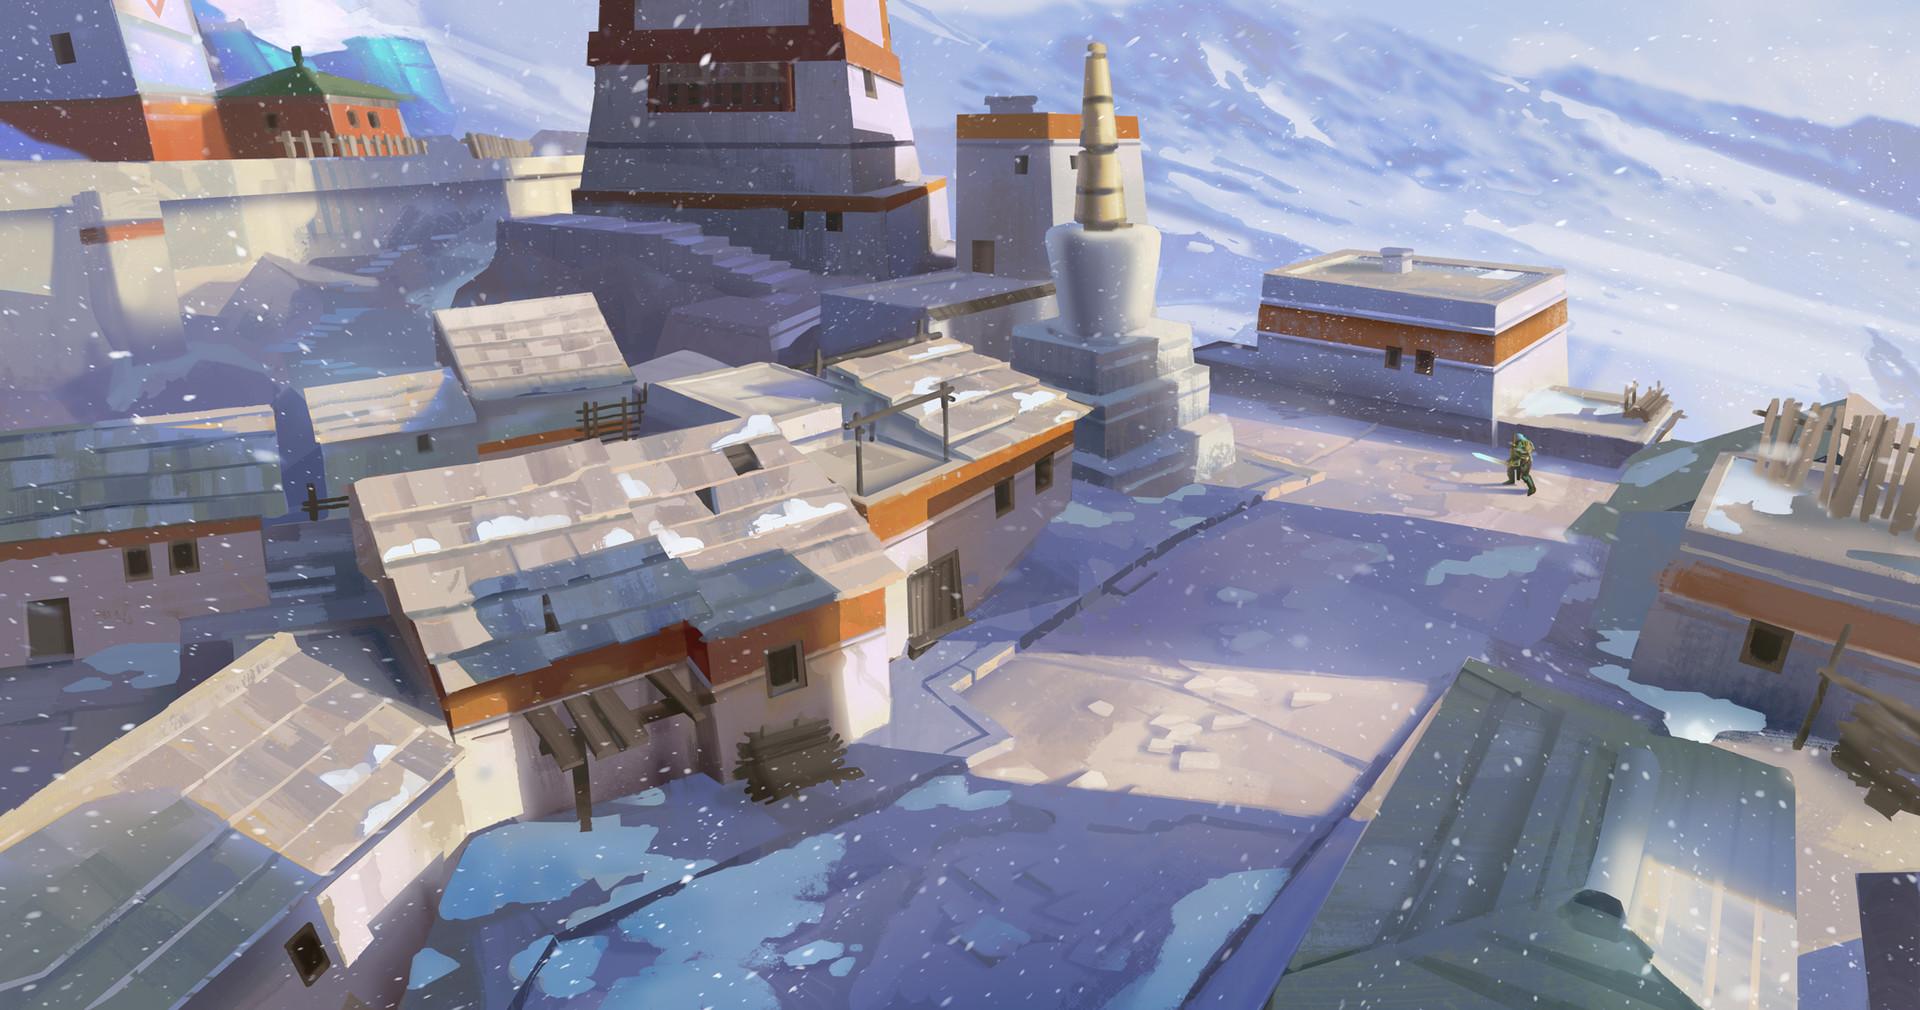 Adrien girod dh phd mountain villagestreet 02 72